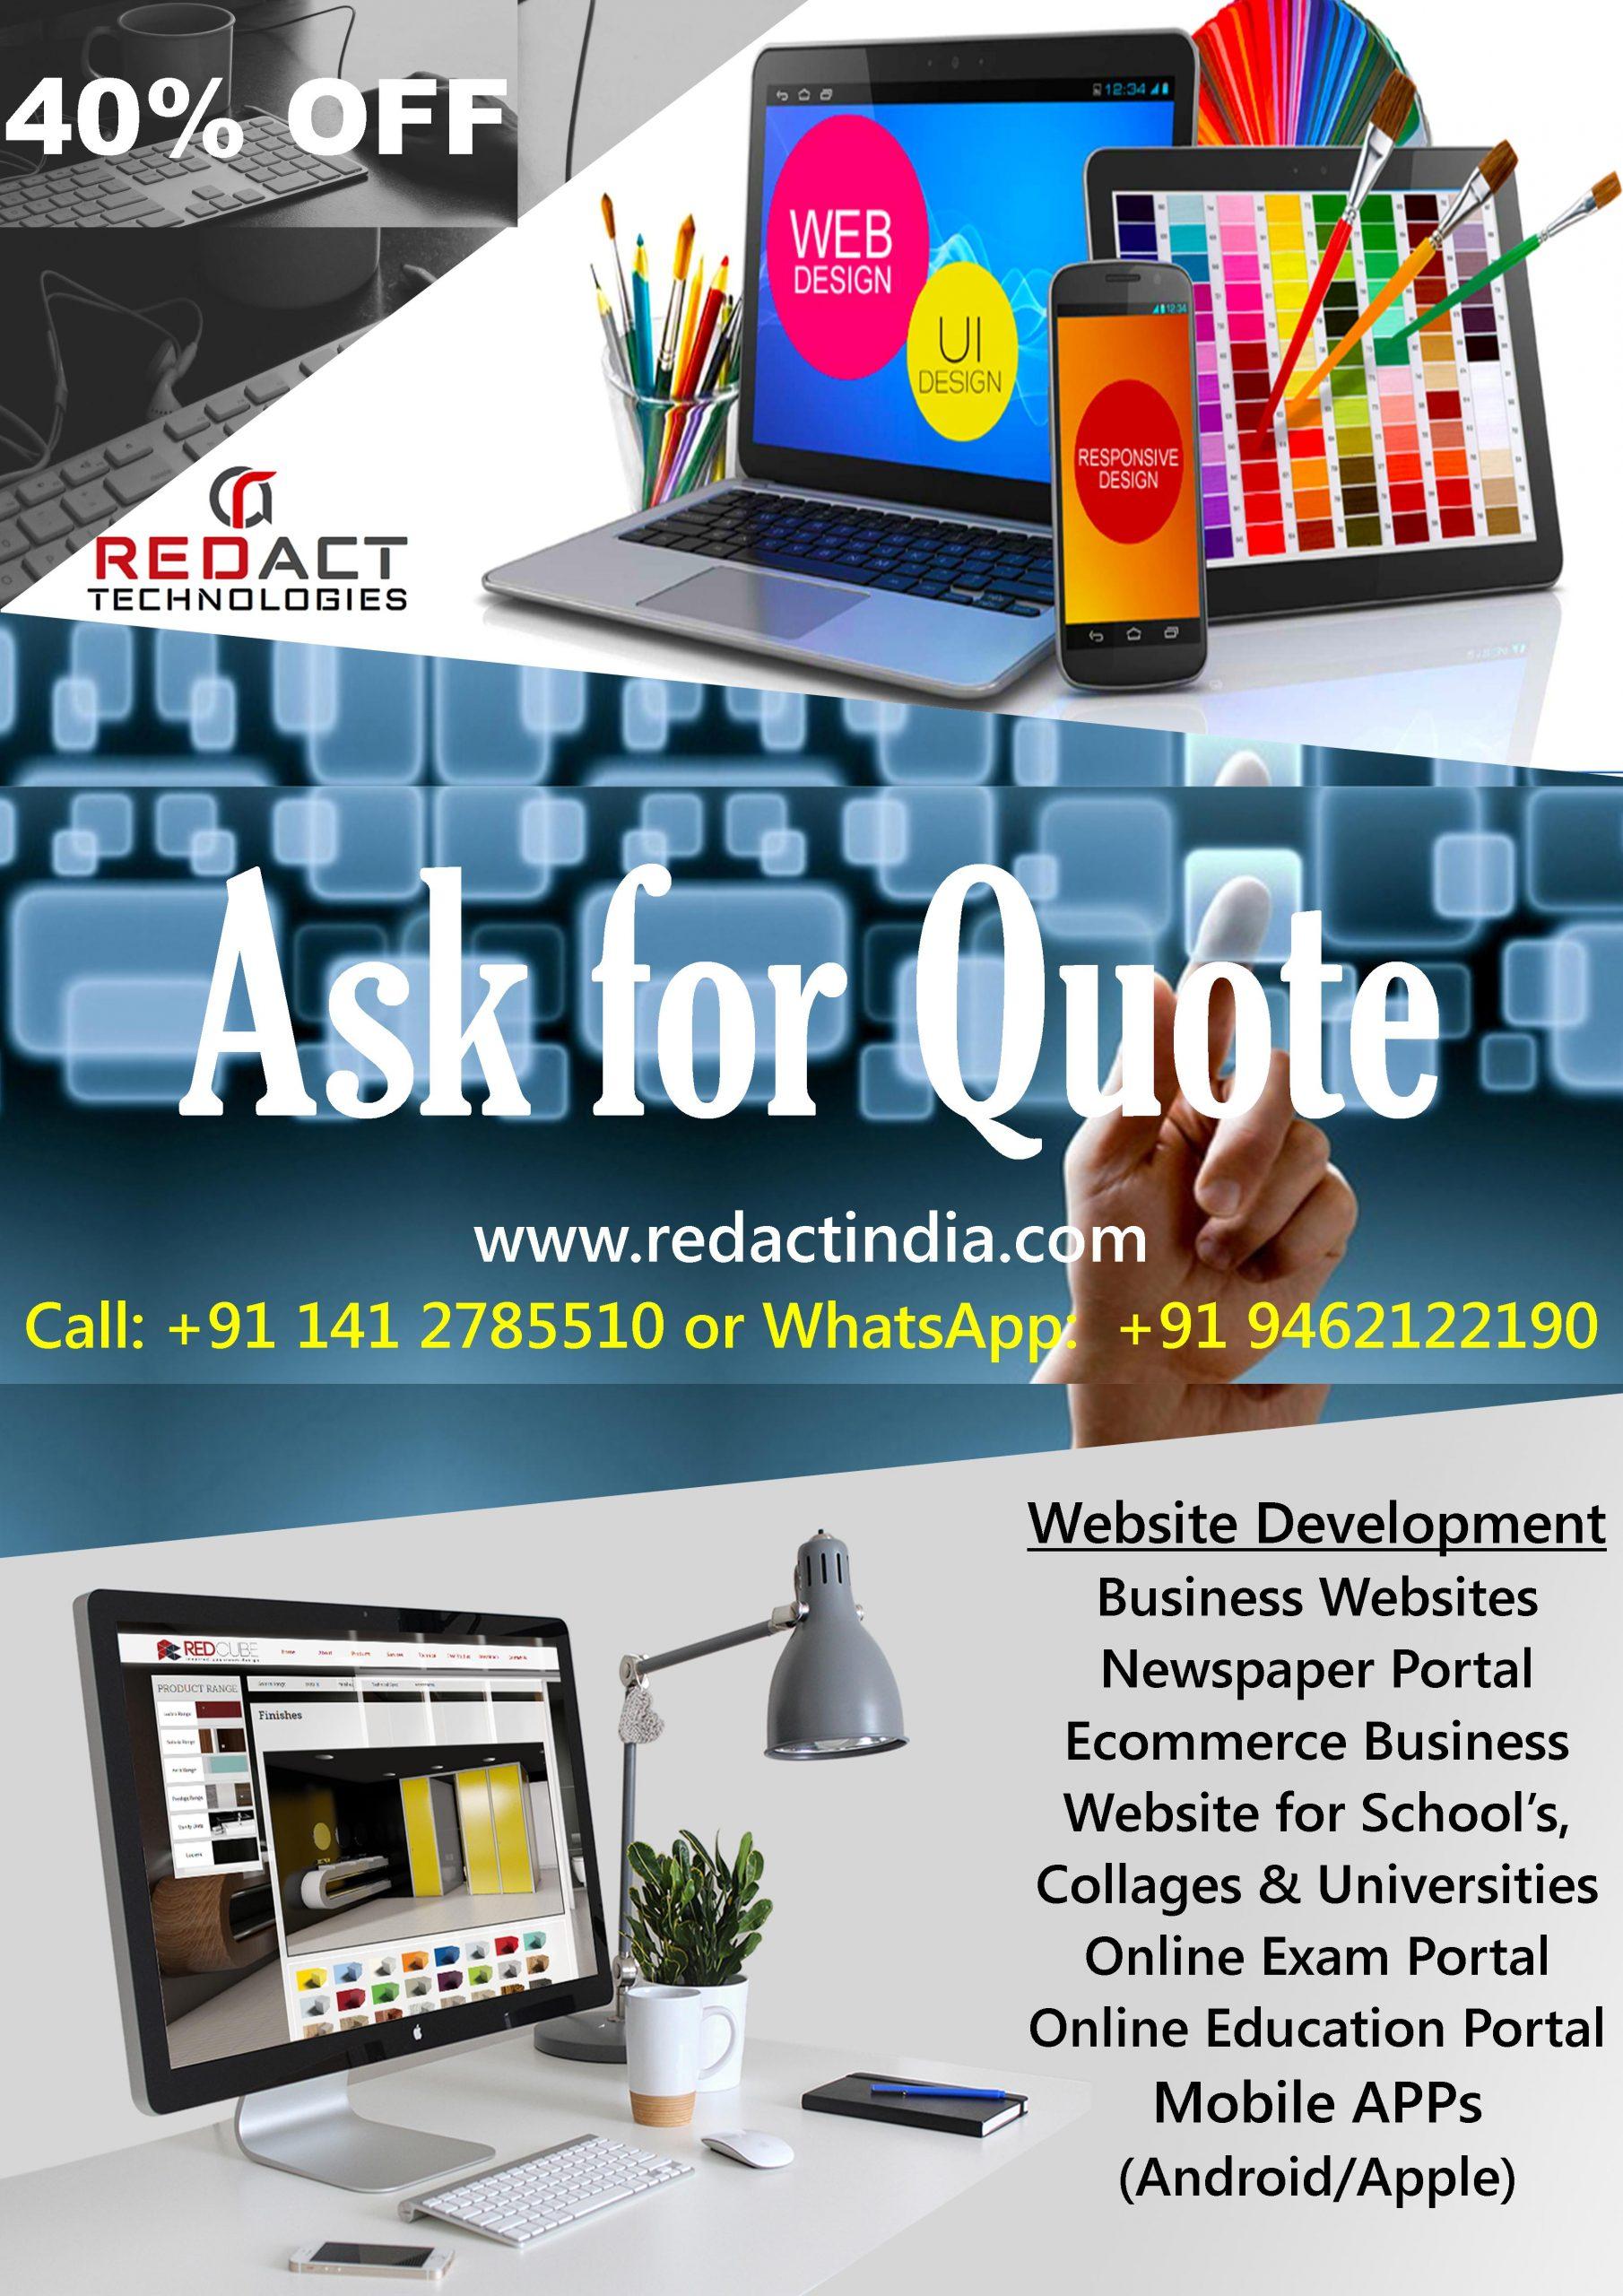 Redact India | Media Solutions | Website Development | APP Development | PR Relations | Events & Promotions